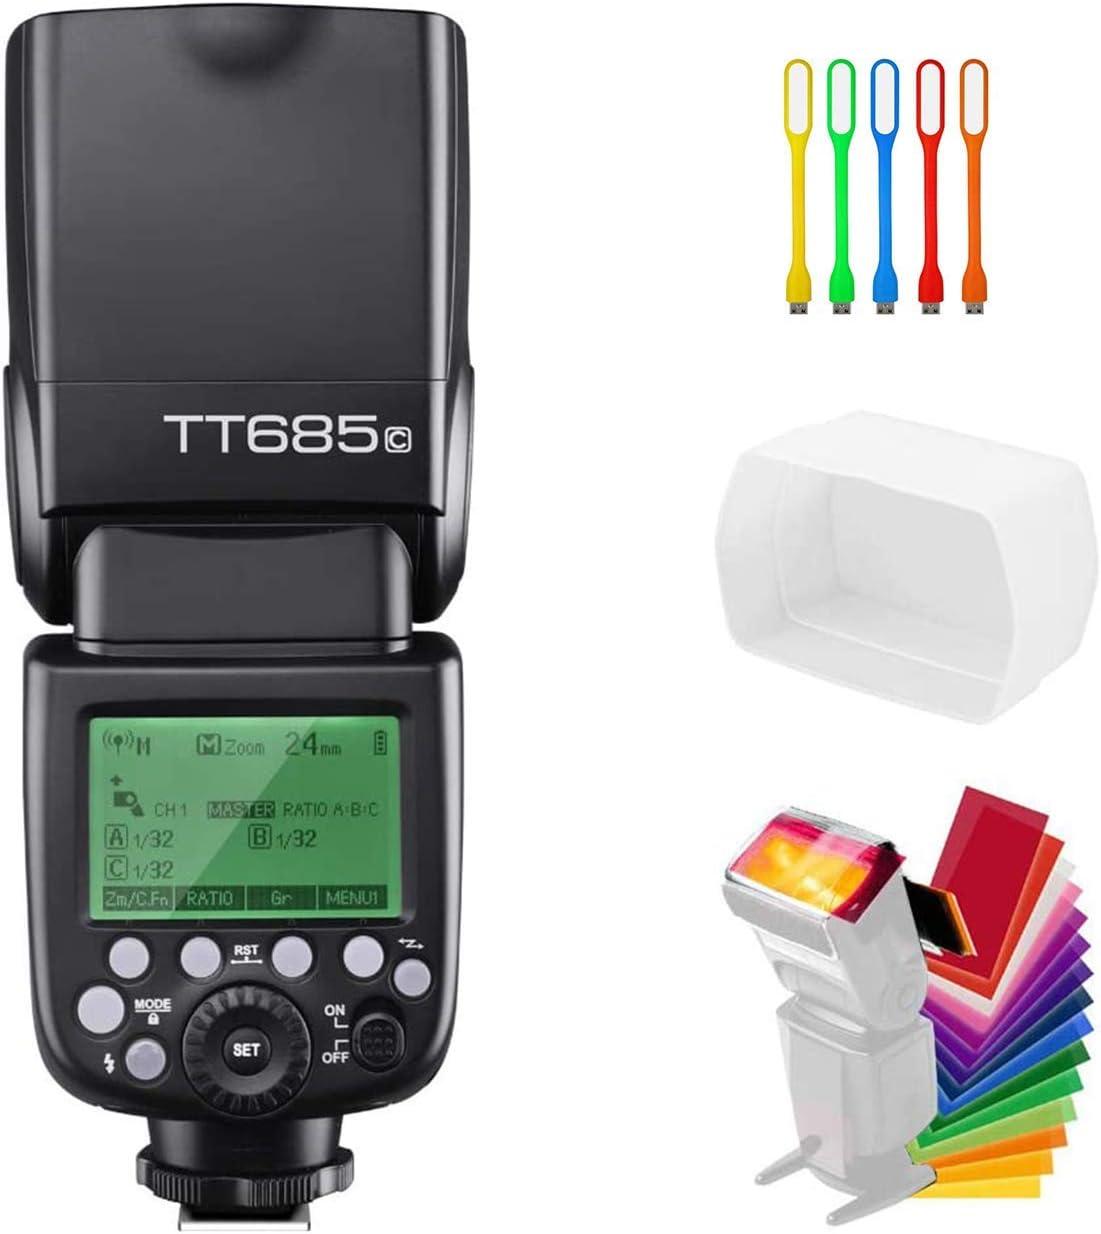 Godox TT685C E-TTL 2.4G GN60 High-Speed Sync 1/8000s Wireless Ma